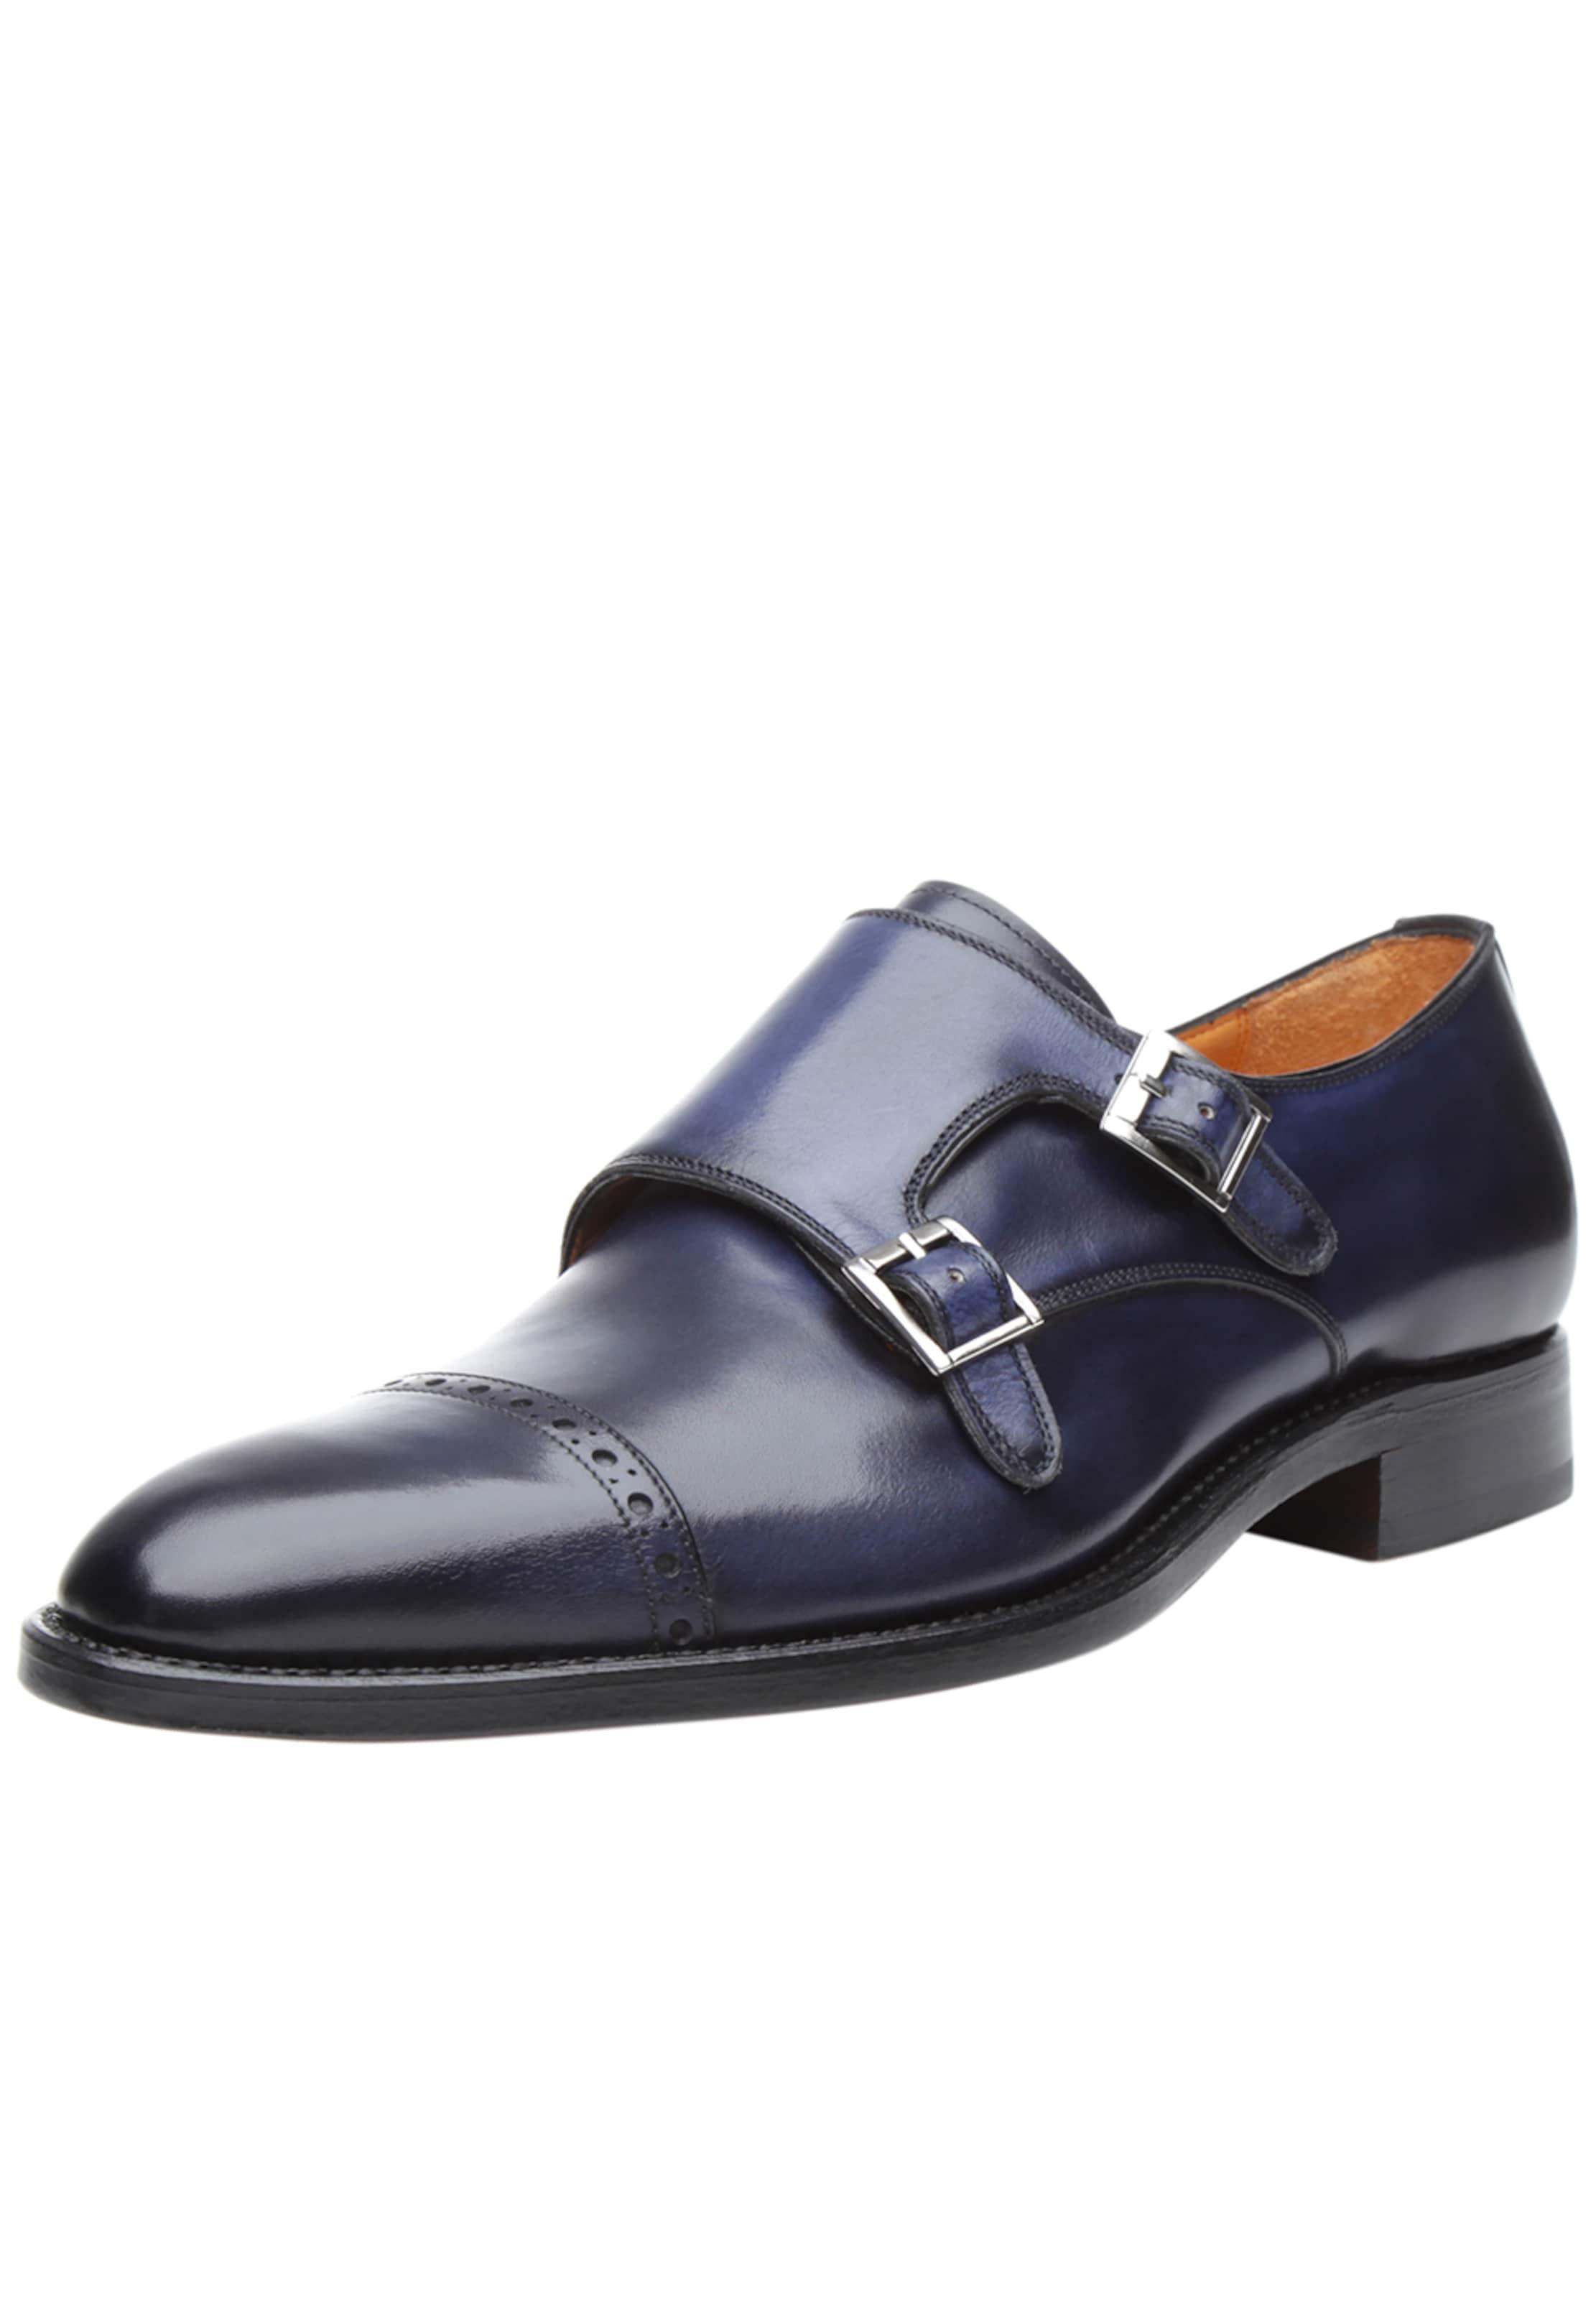 SHOEPASSION Halbschuhe No. 5422 Verschleißfeste billige Schuhe